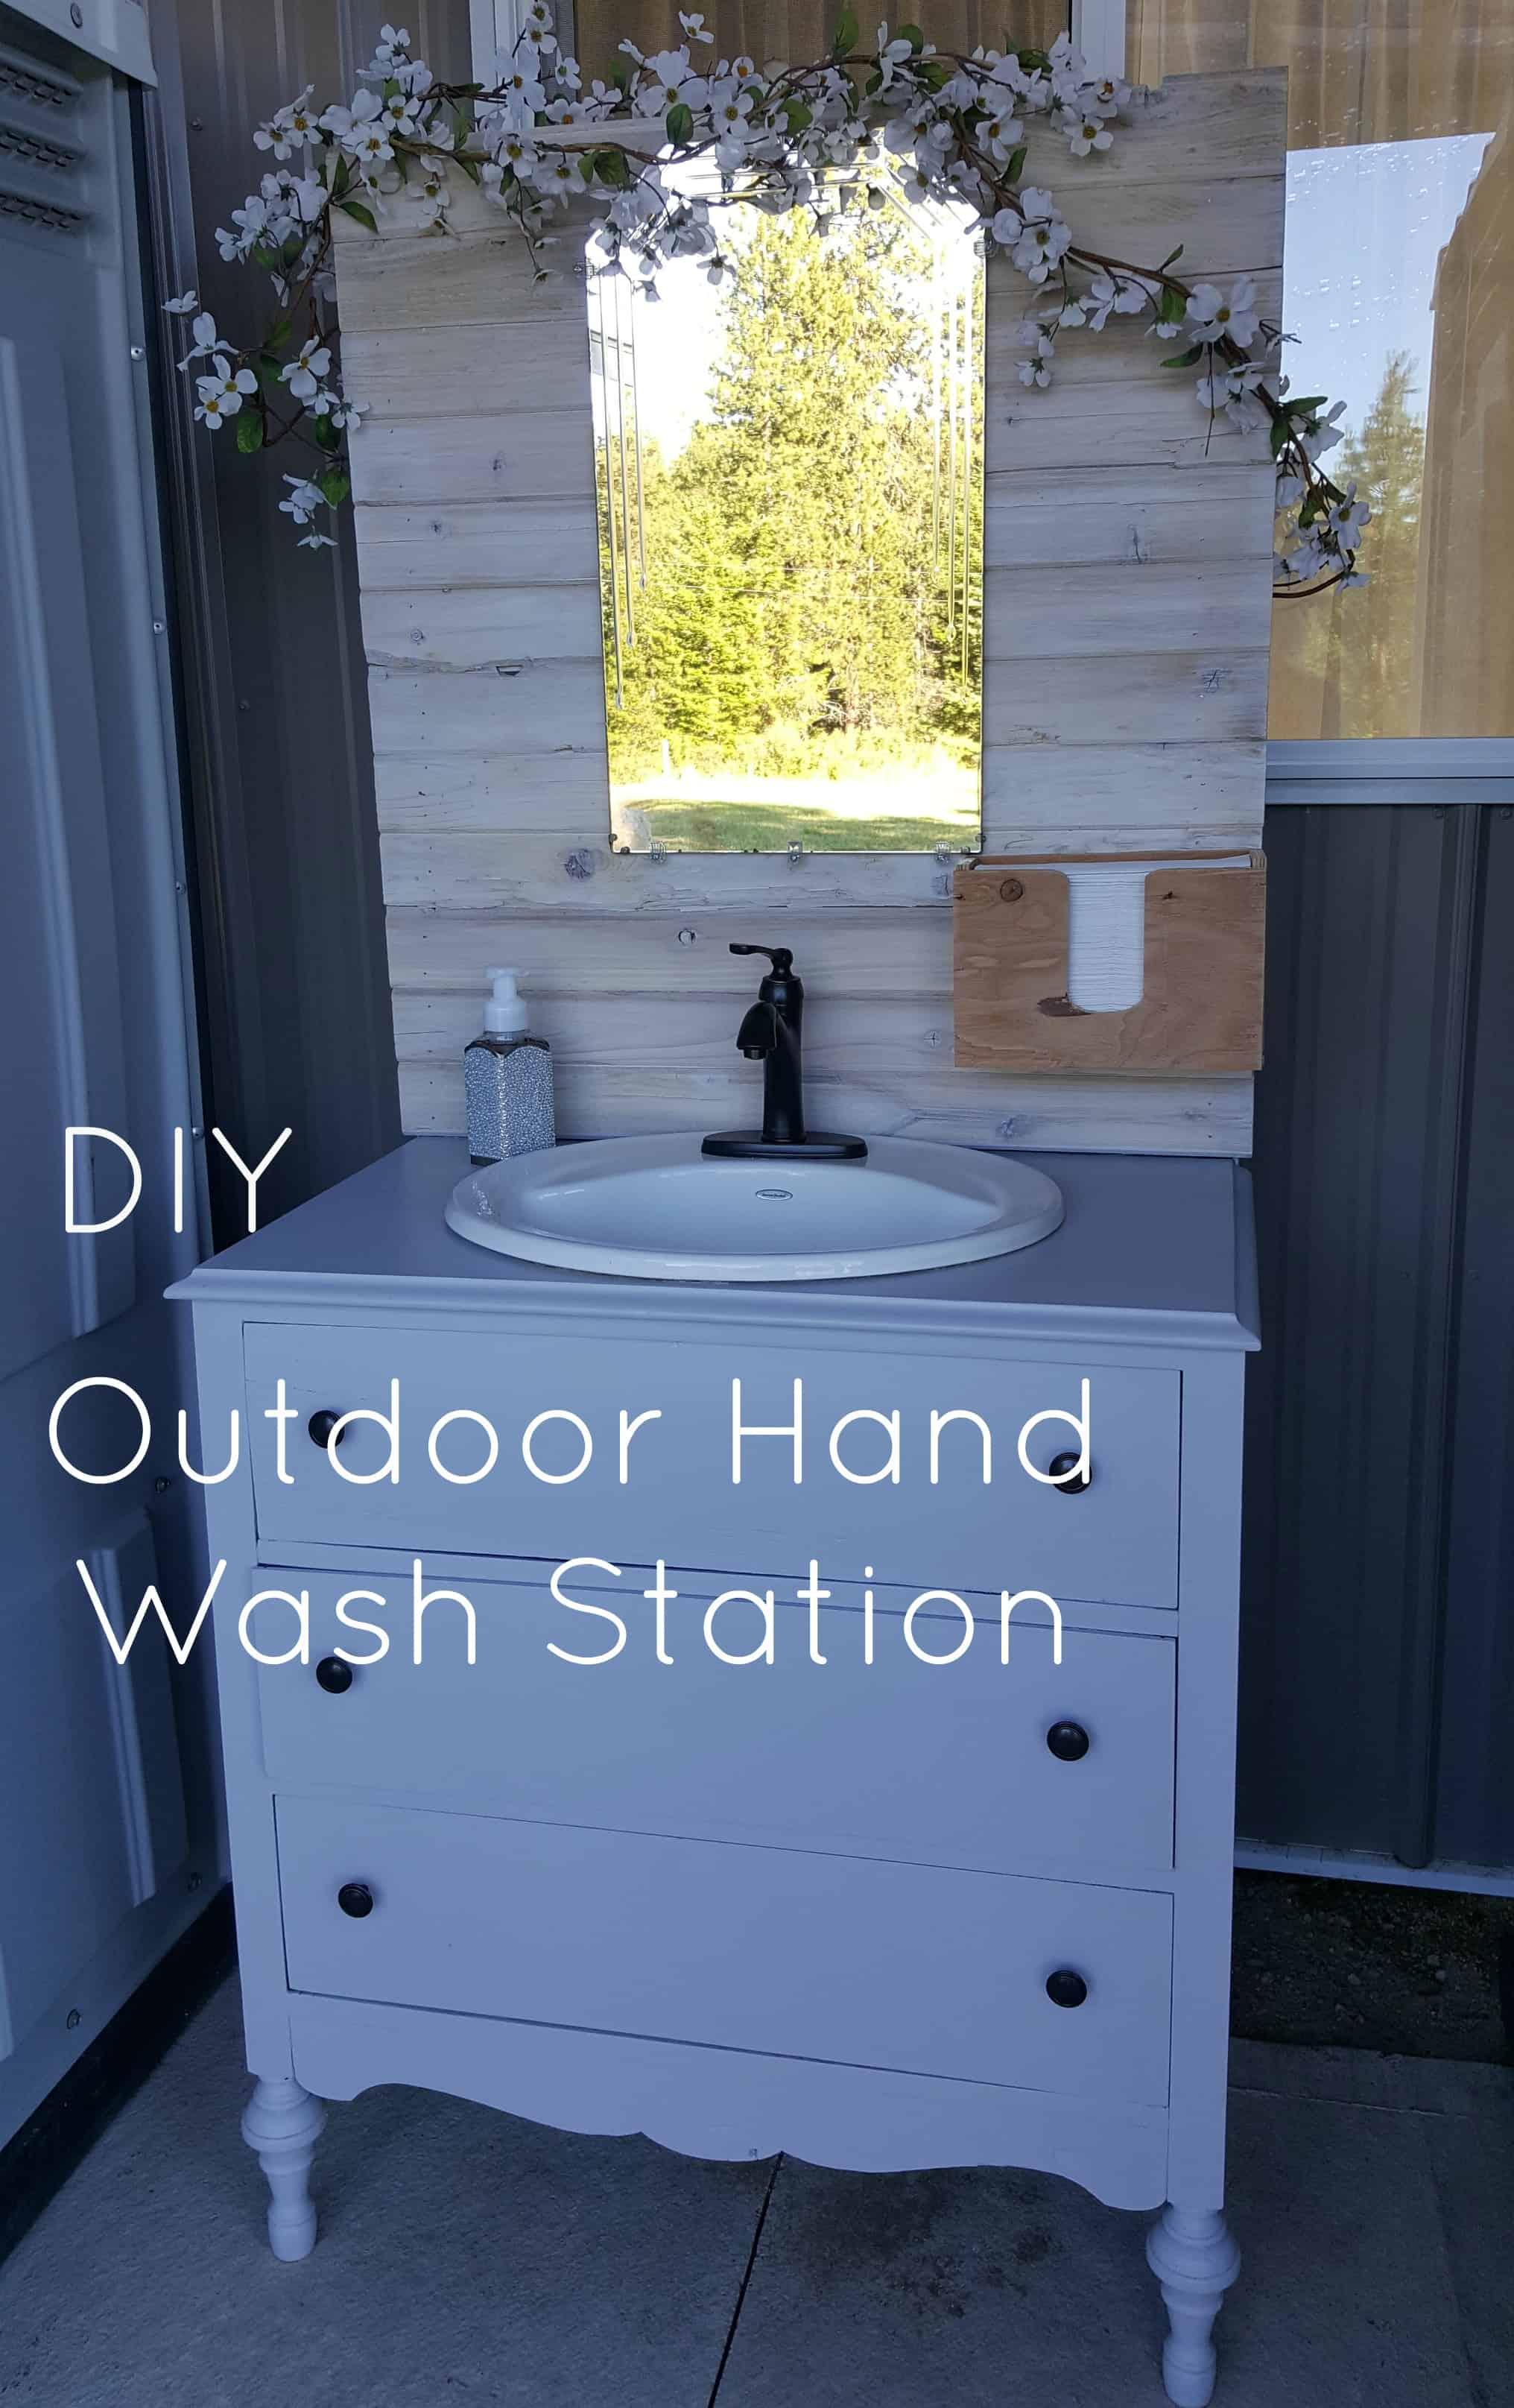 Diy Outdoor Hand Wash Station Denison Ridge Weddings